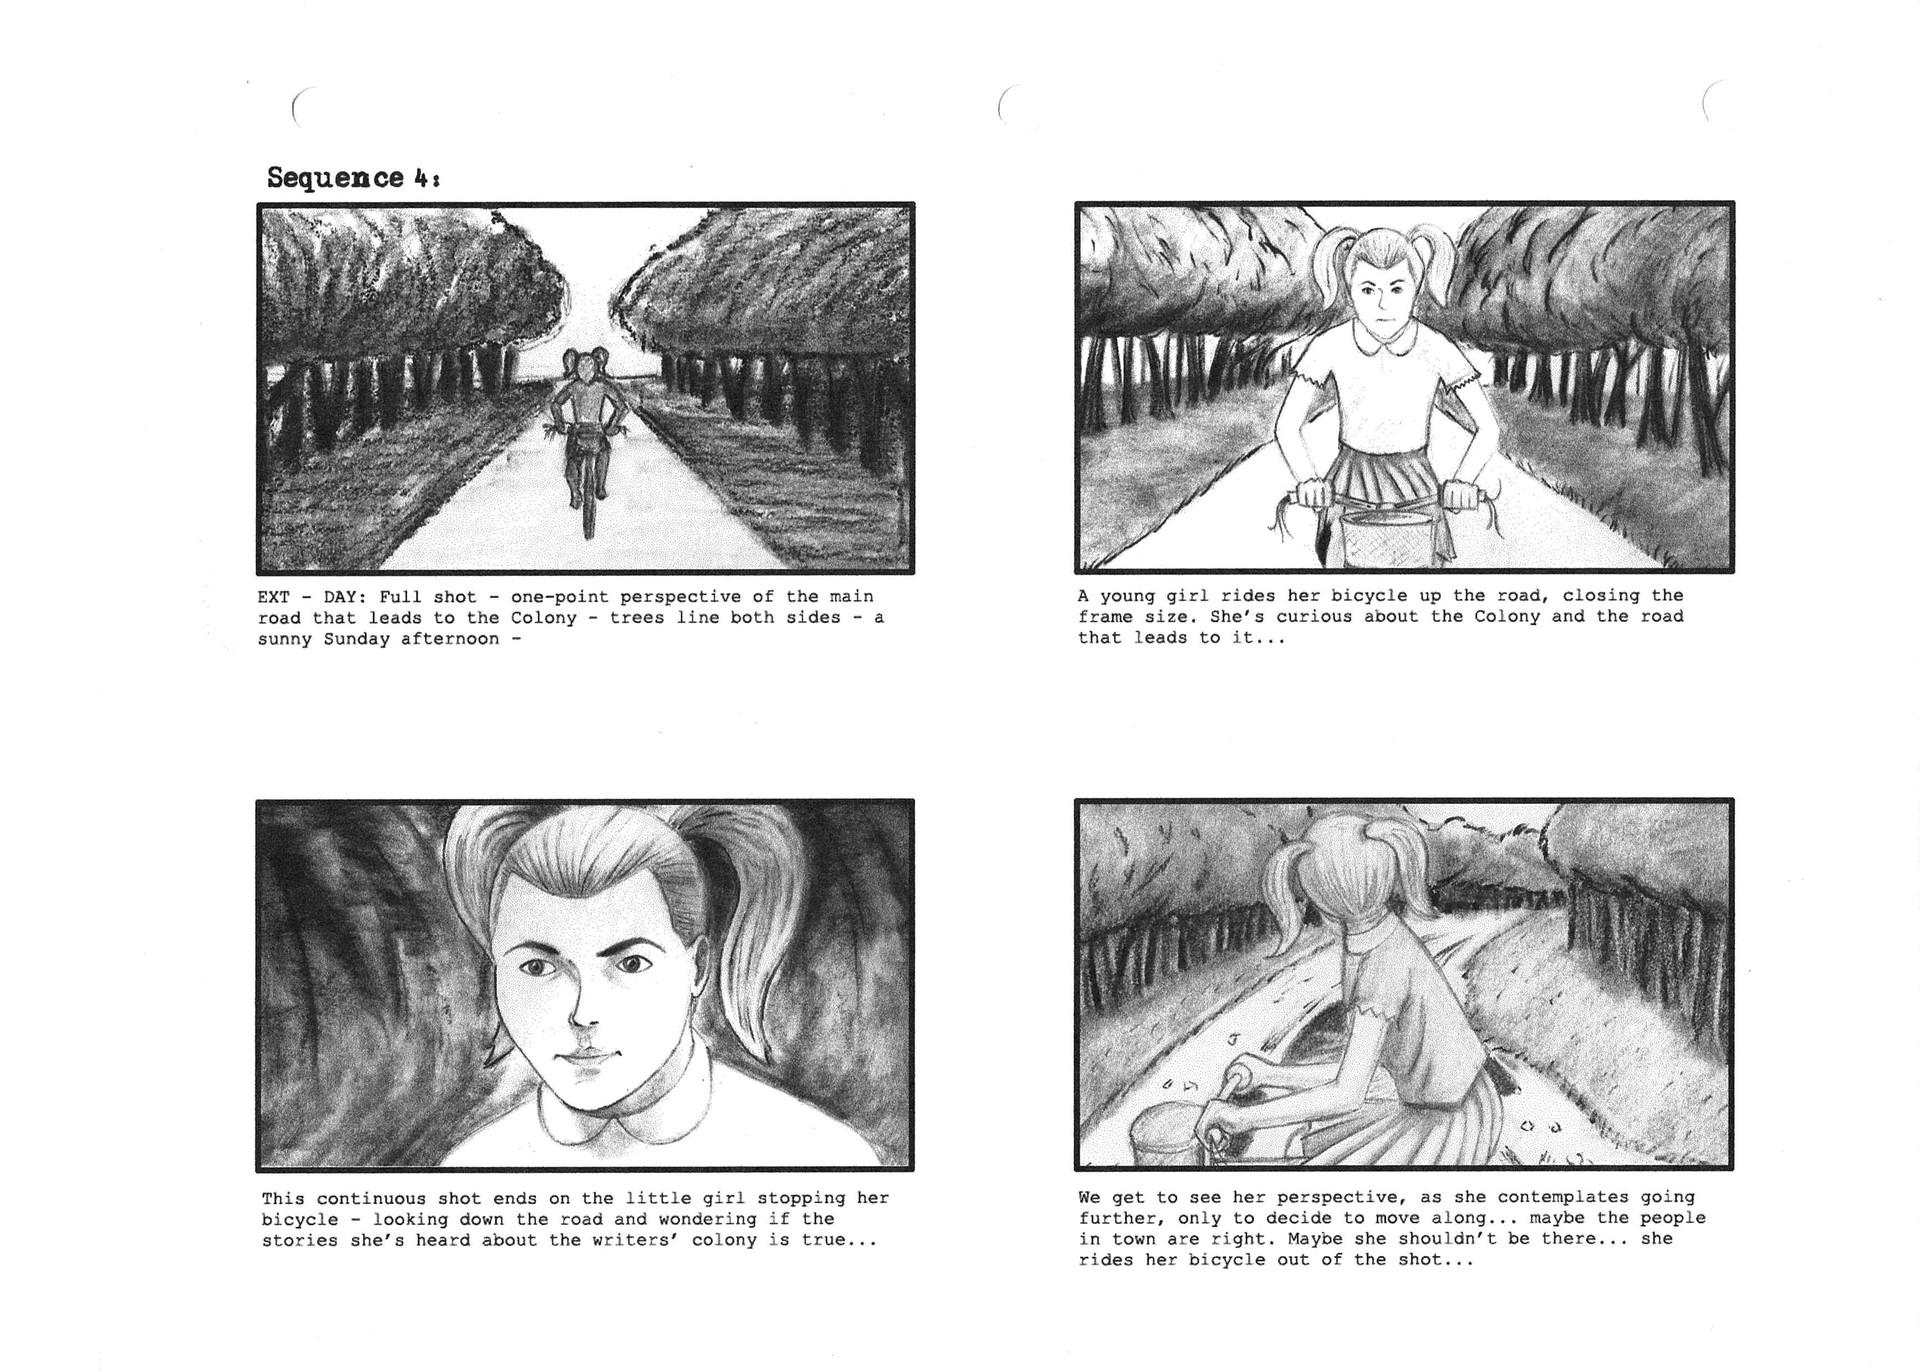 Dwayne stacho tlhwc storyboards 6